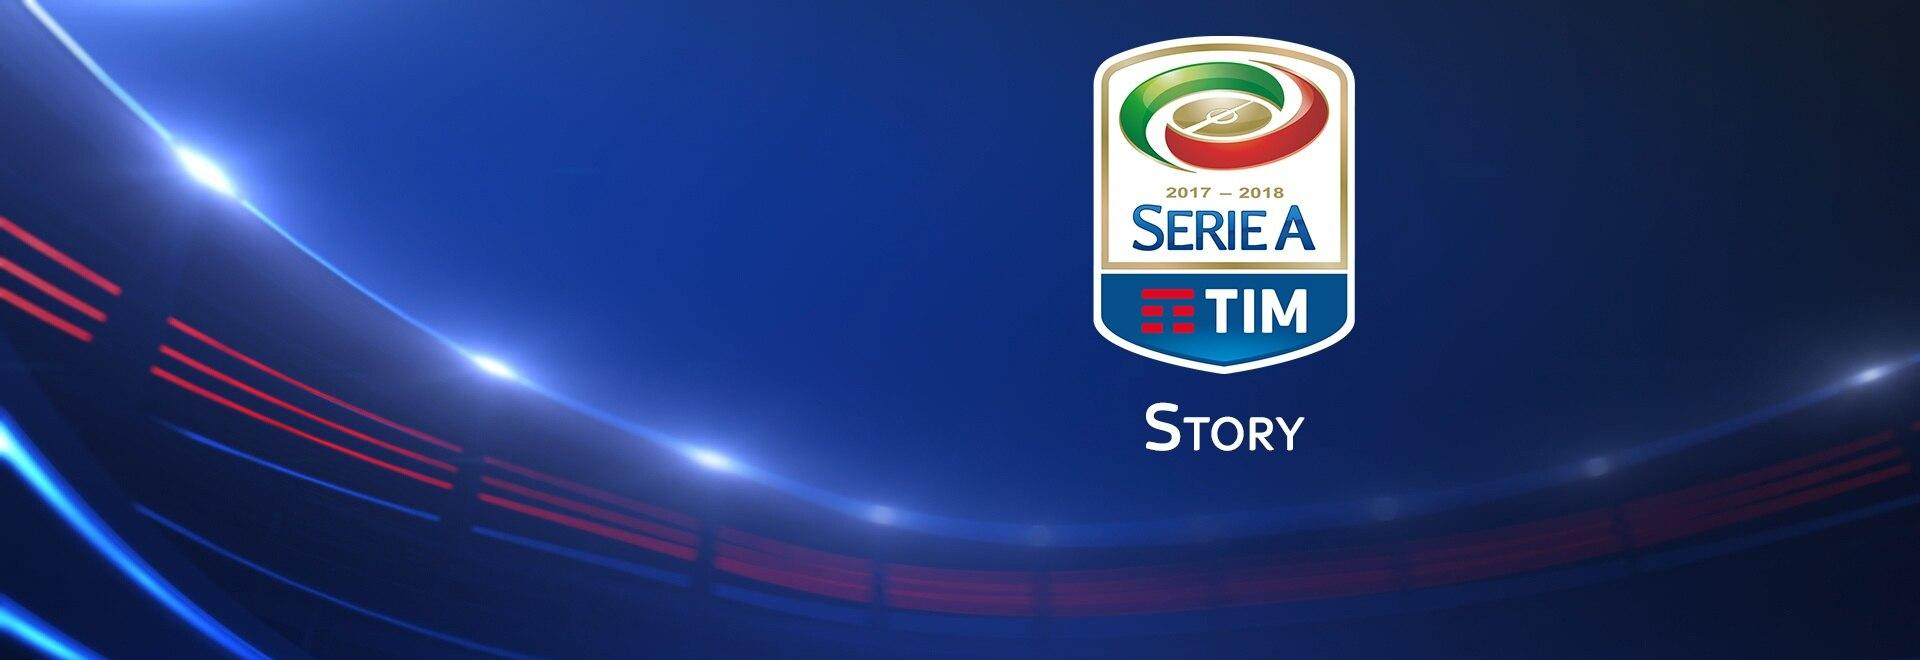 Roma - Inter 02/12/18